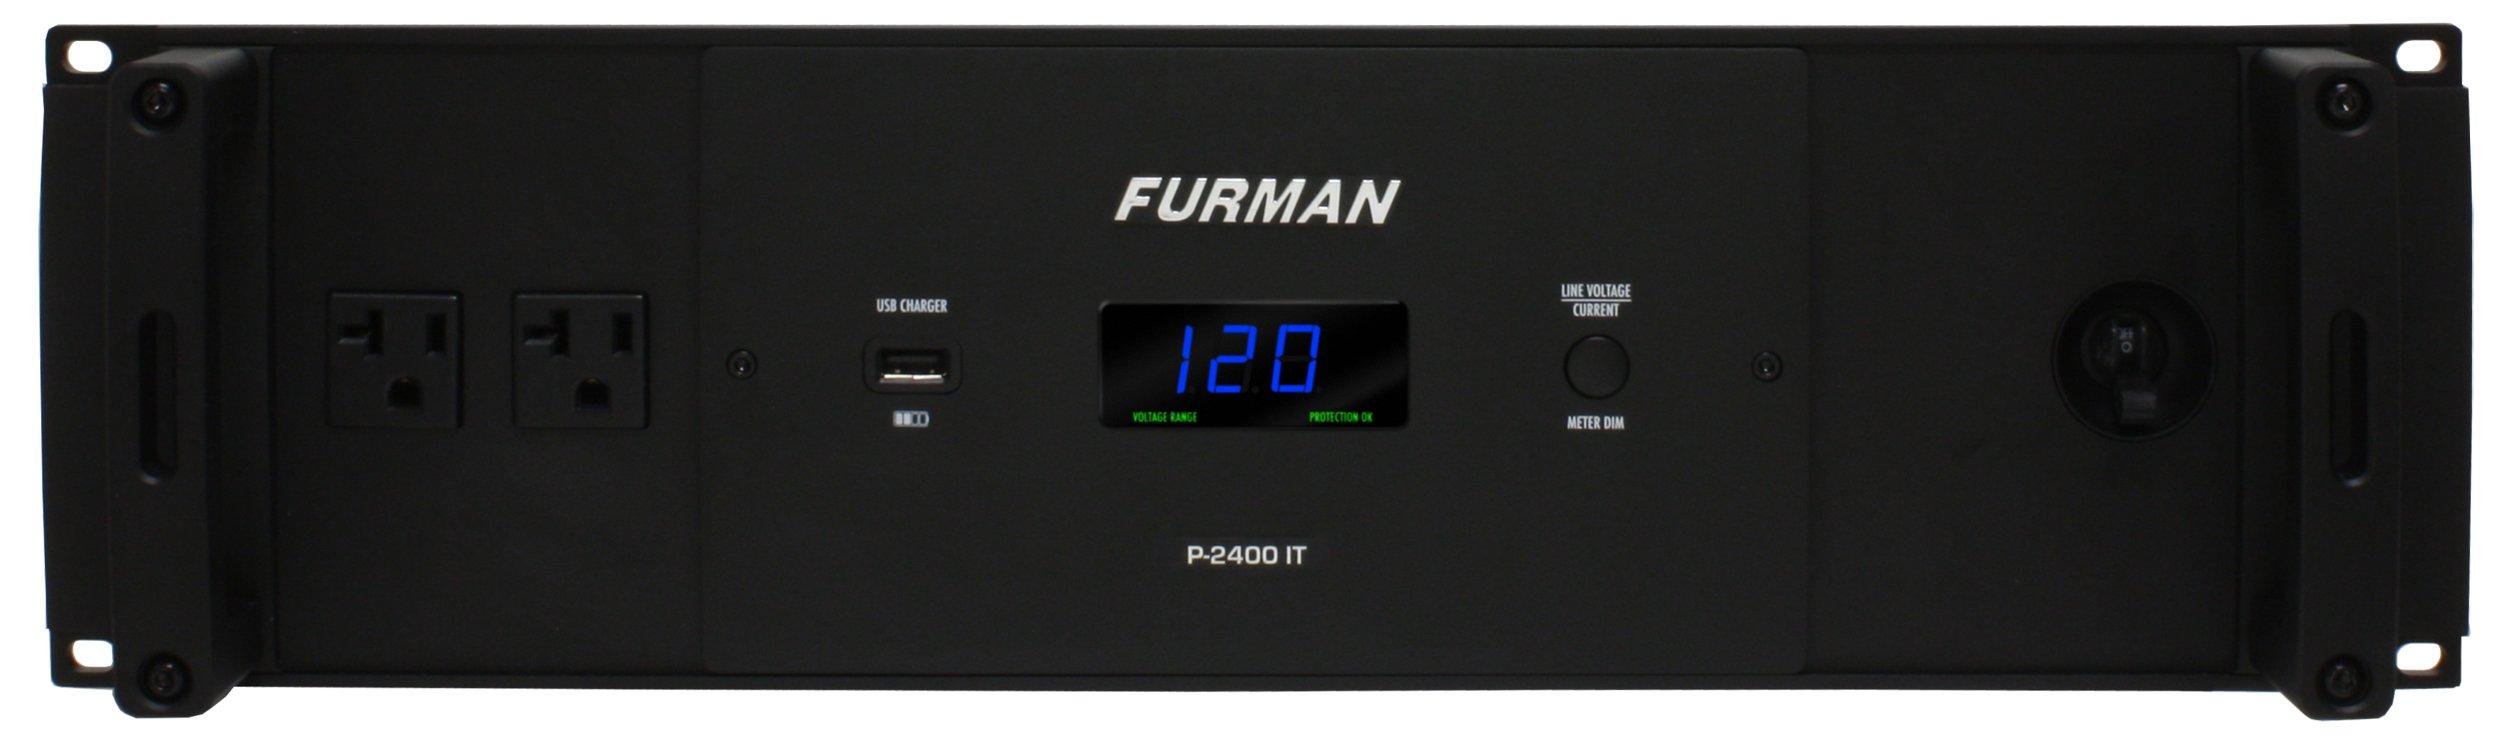 Furman P-2400 IT Power Conditioner - Black